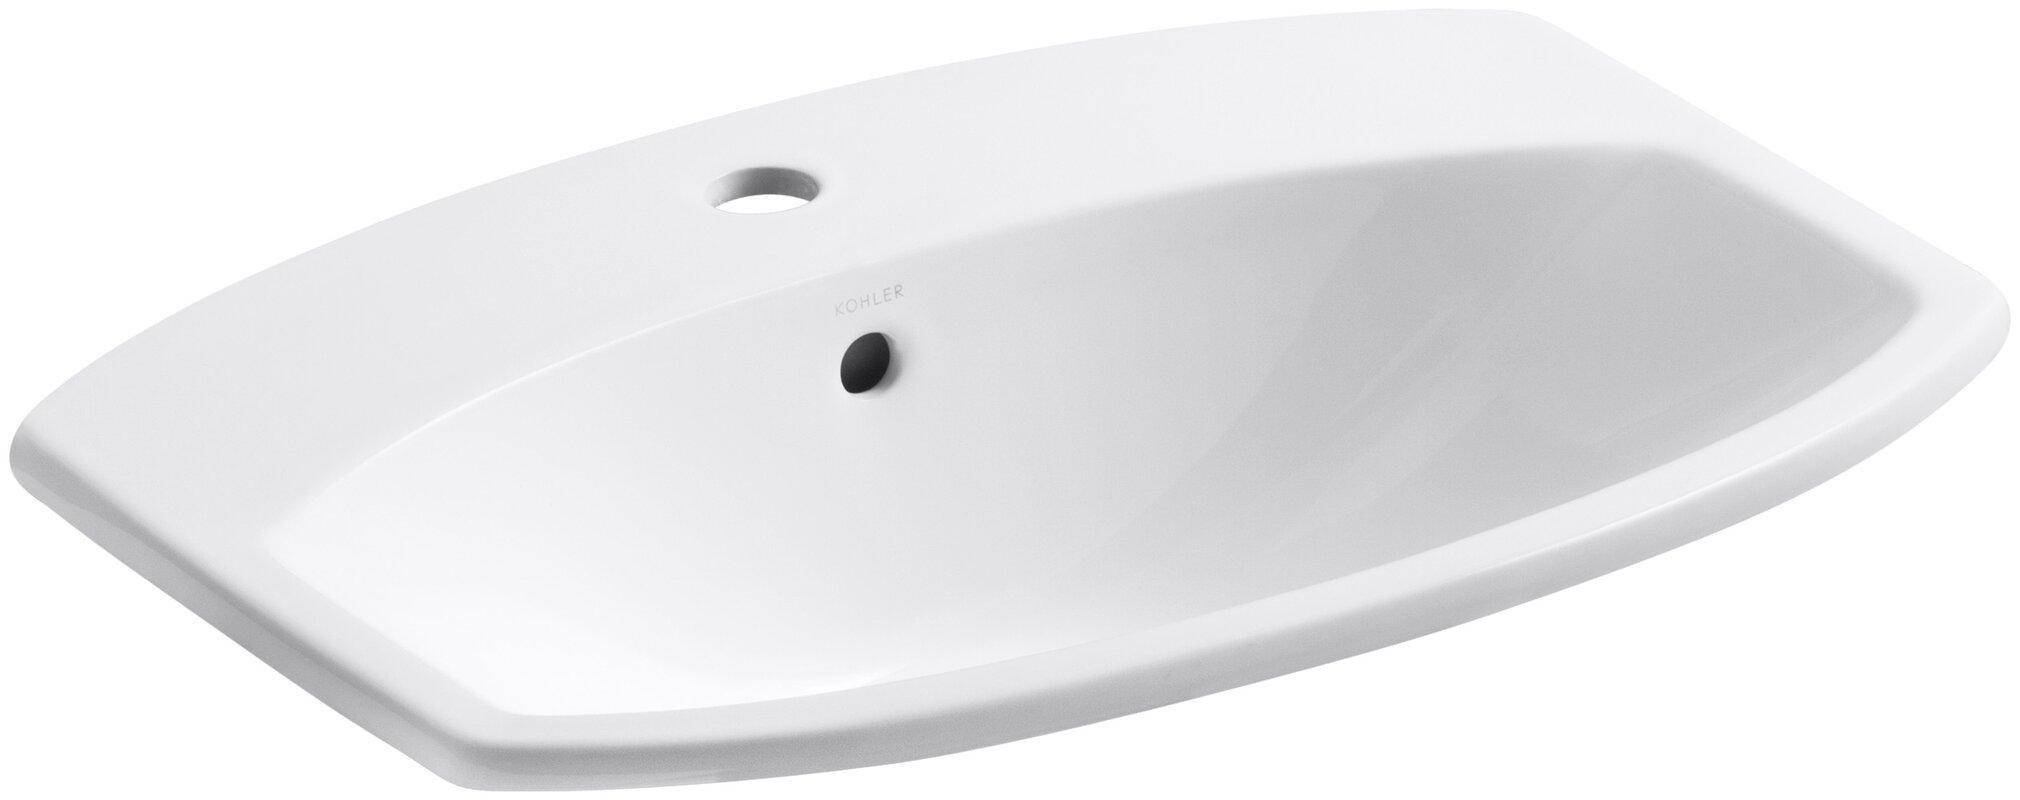 Cimarron Ceramic Rectangular Drop In Bathroom Sink With